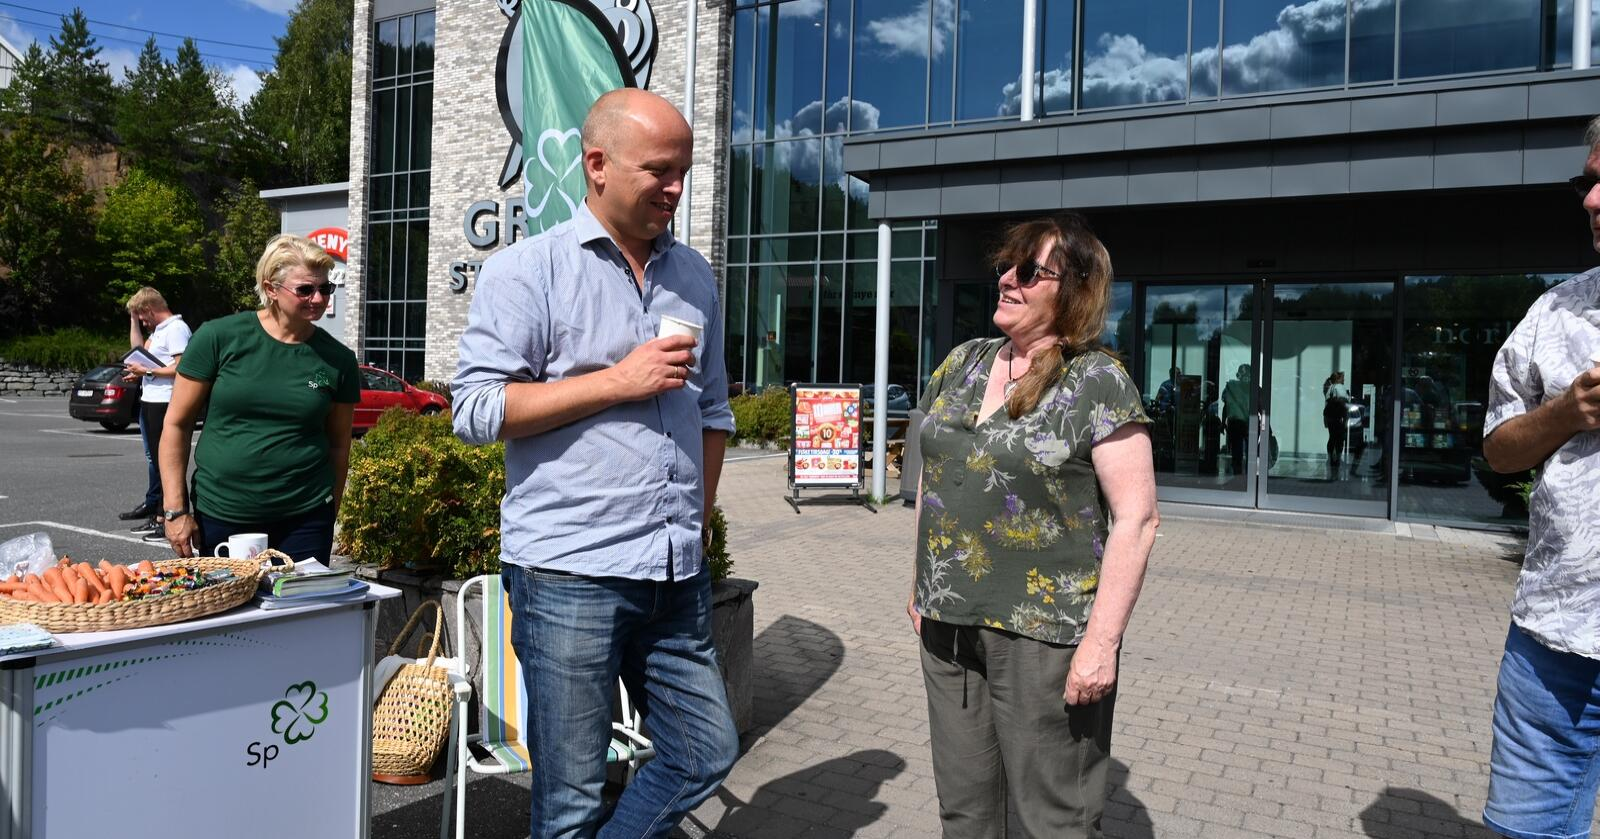 Siri Berg Flaa møtte Trygve Slagsvold Vedum på stand i valgkampen i Tvedestrand. I høst stemte hun på Sp for første gang. Foto: Sindre Haugen Mehl/Agderposten